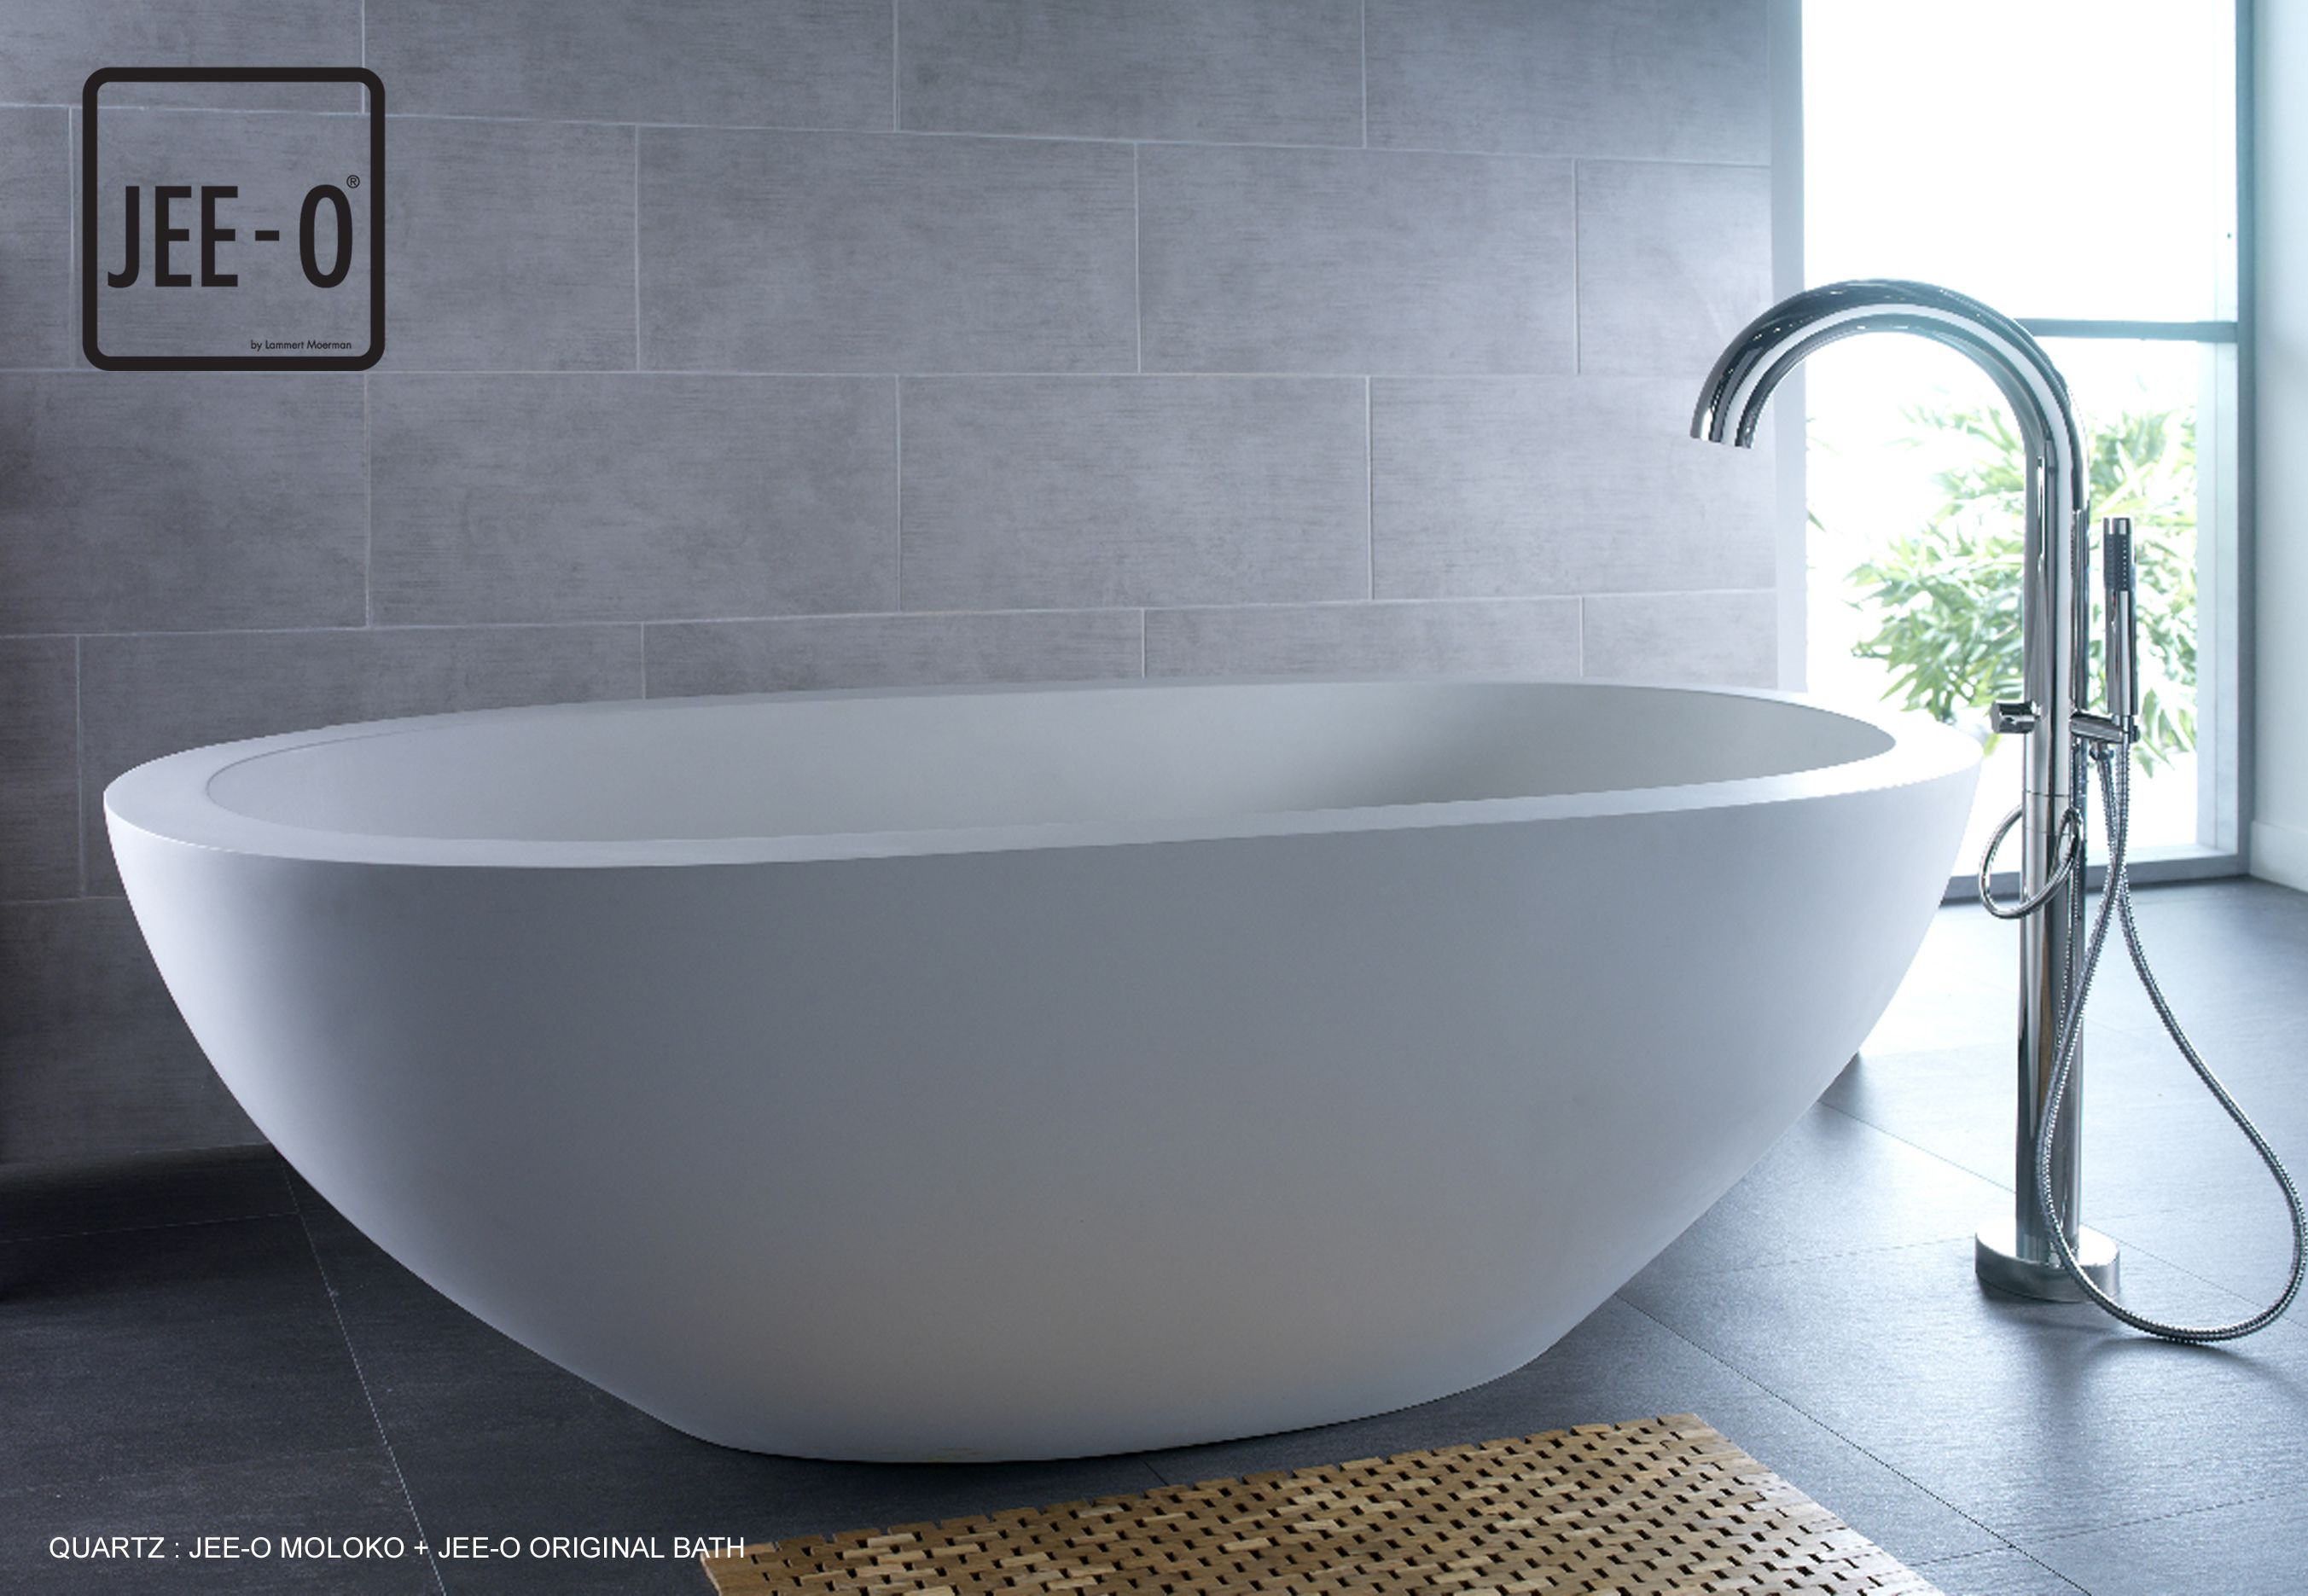 Badkamer Vrijstaand Bad : Vrijstaand bad badkamer en co info over badkamers duscholux bad